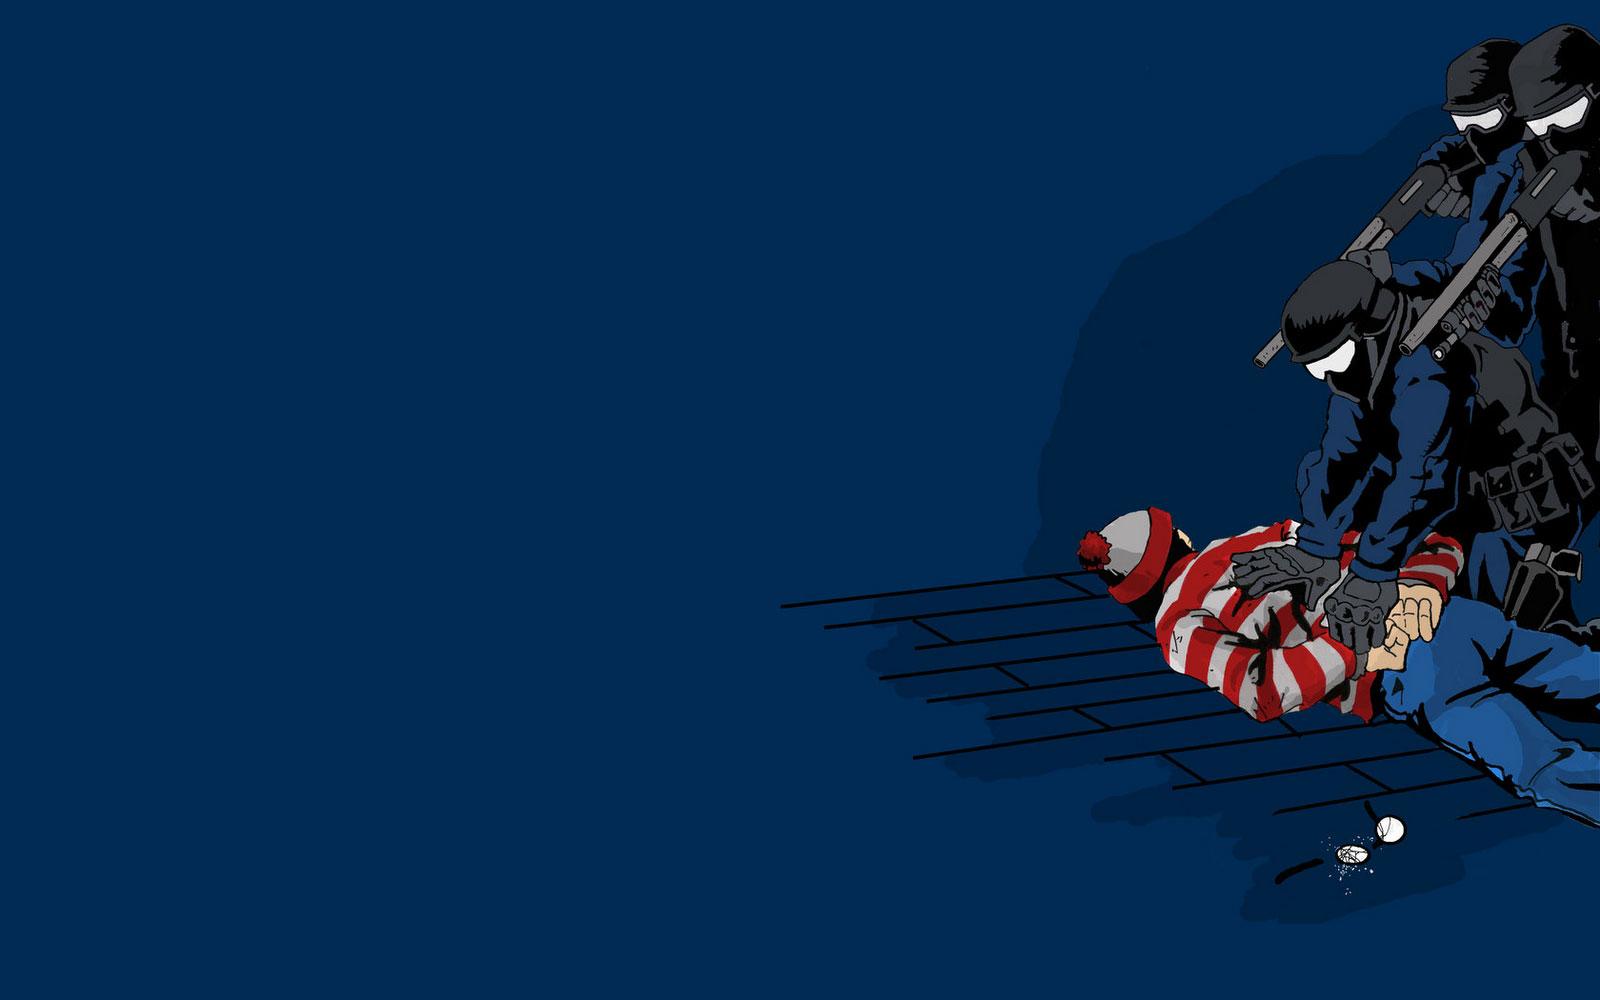 Word on the street is that Waldo wears stripes to break up the 1600x1000